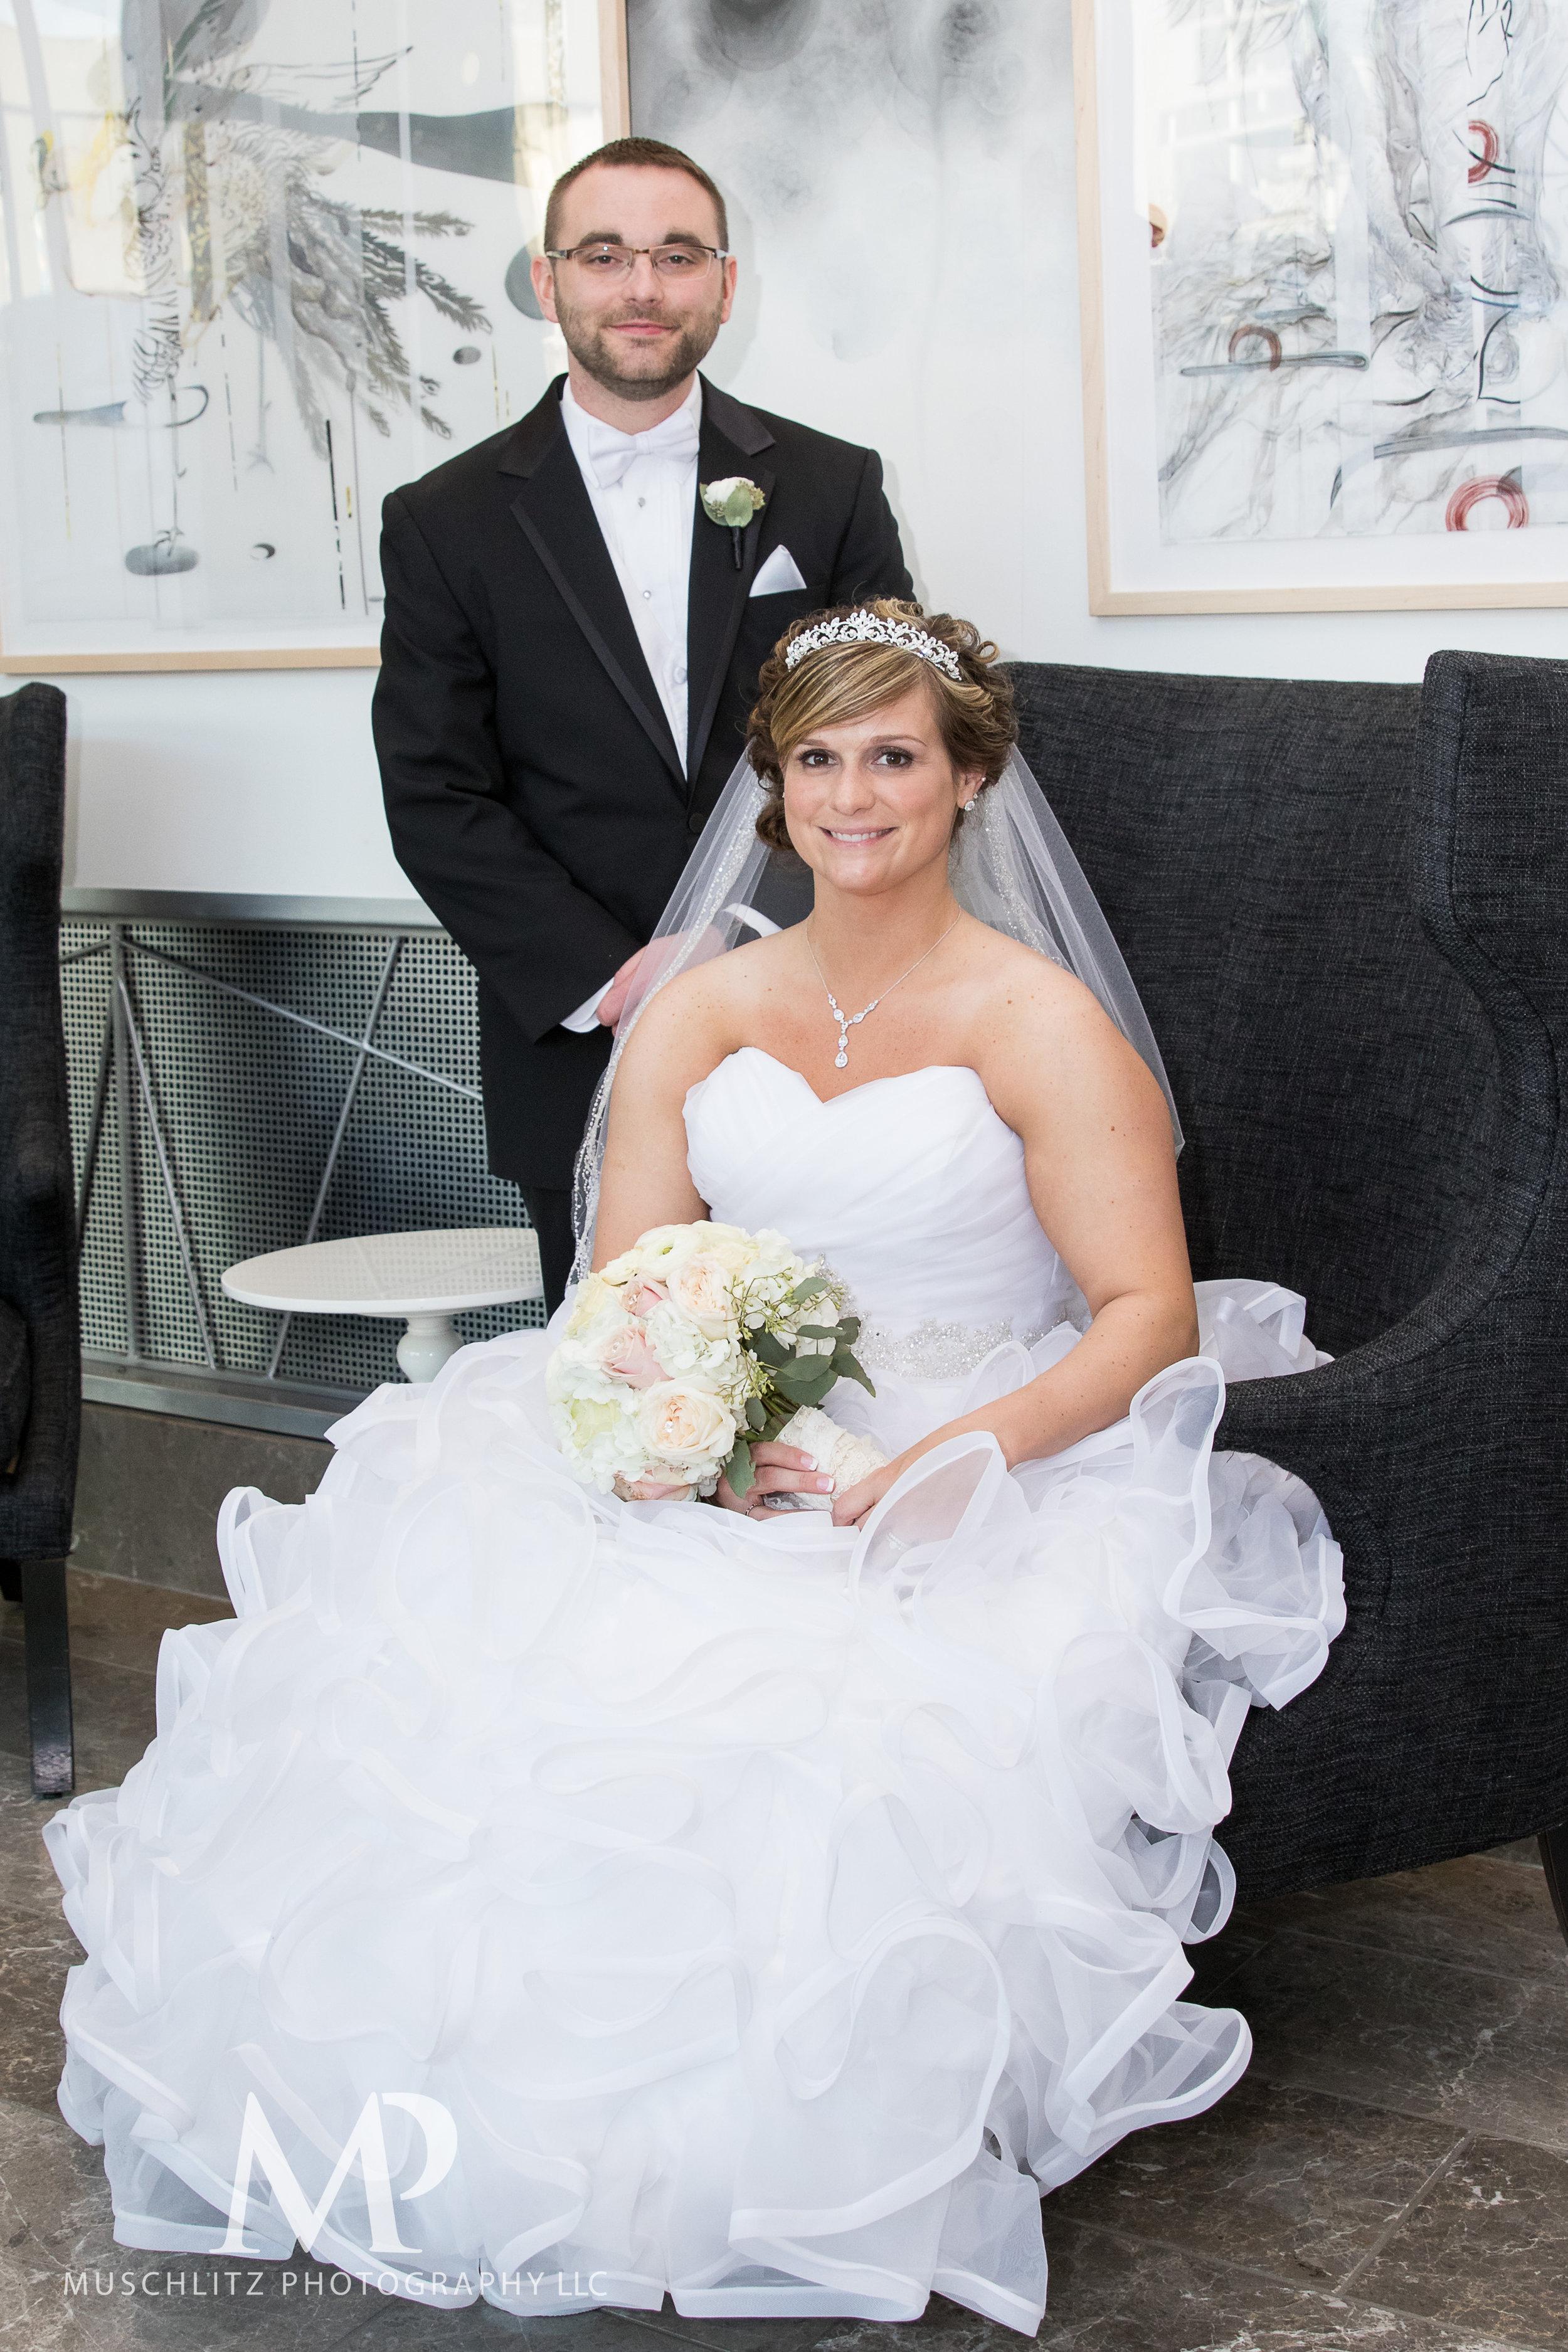 the hilton-columbus-wedding-portraits-downtown-columbus-ohio-muschlitz-photography-015.JPG